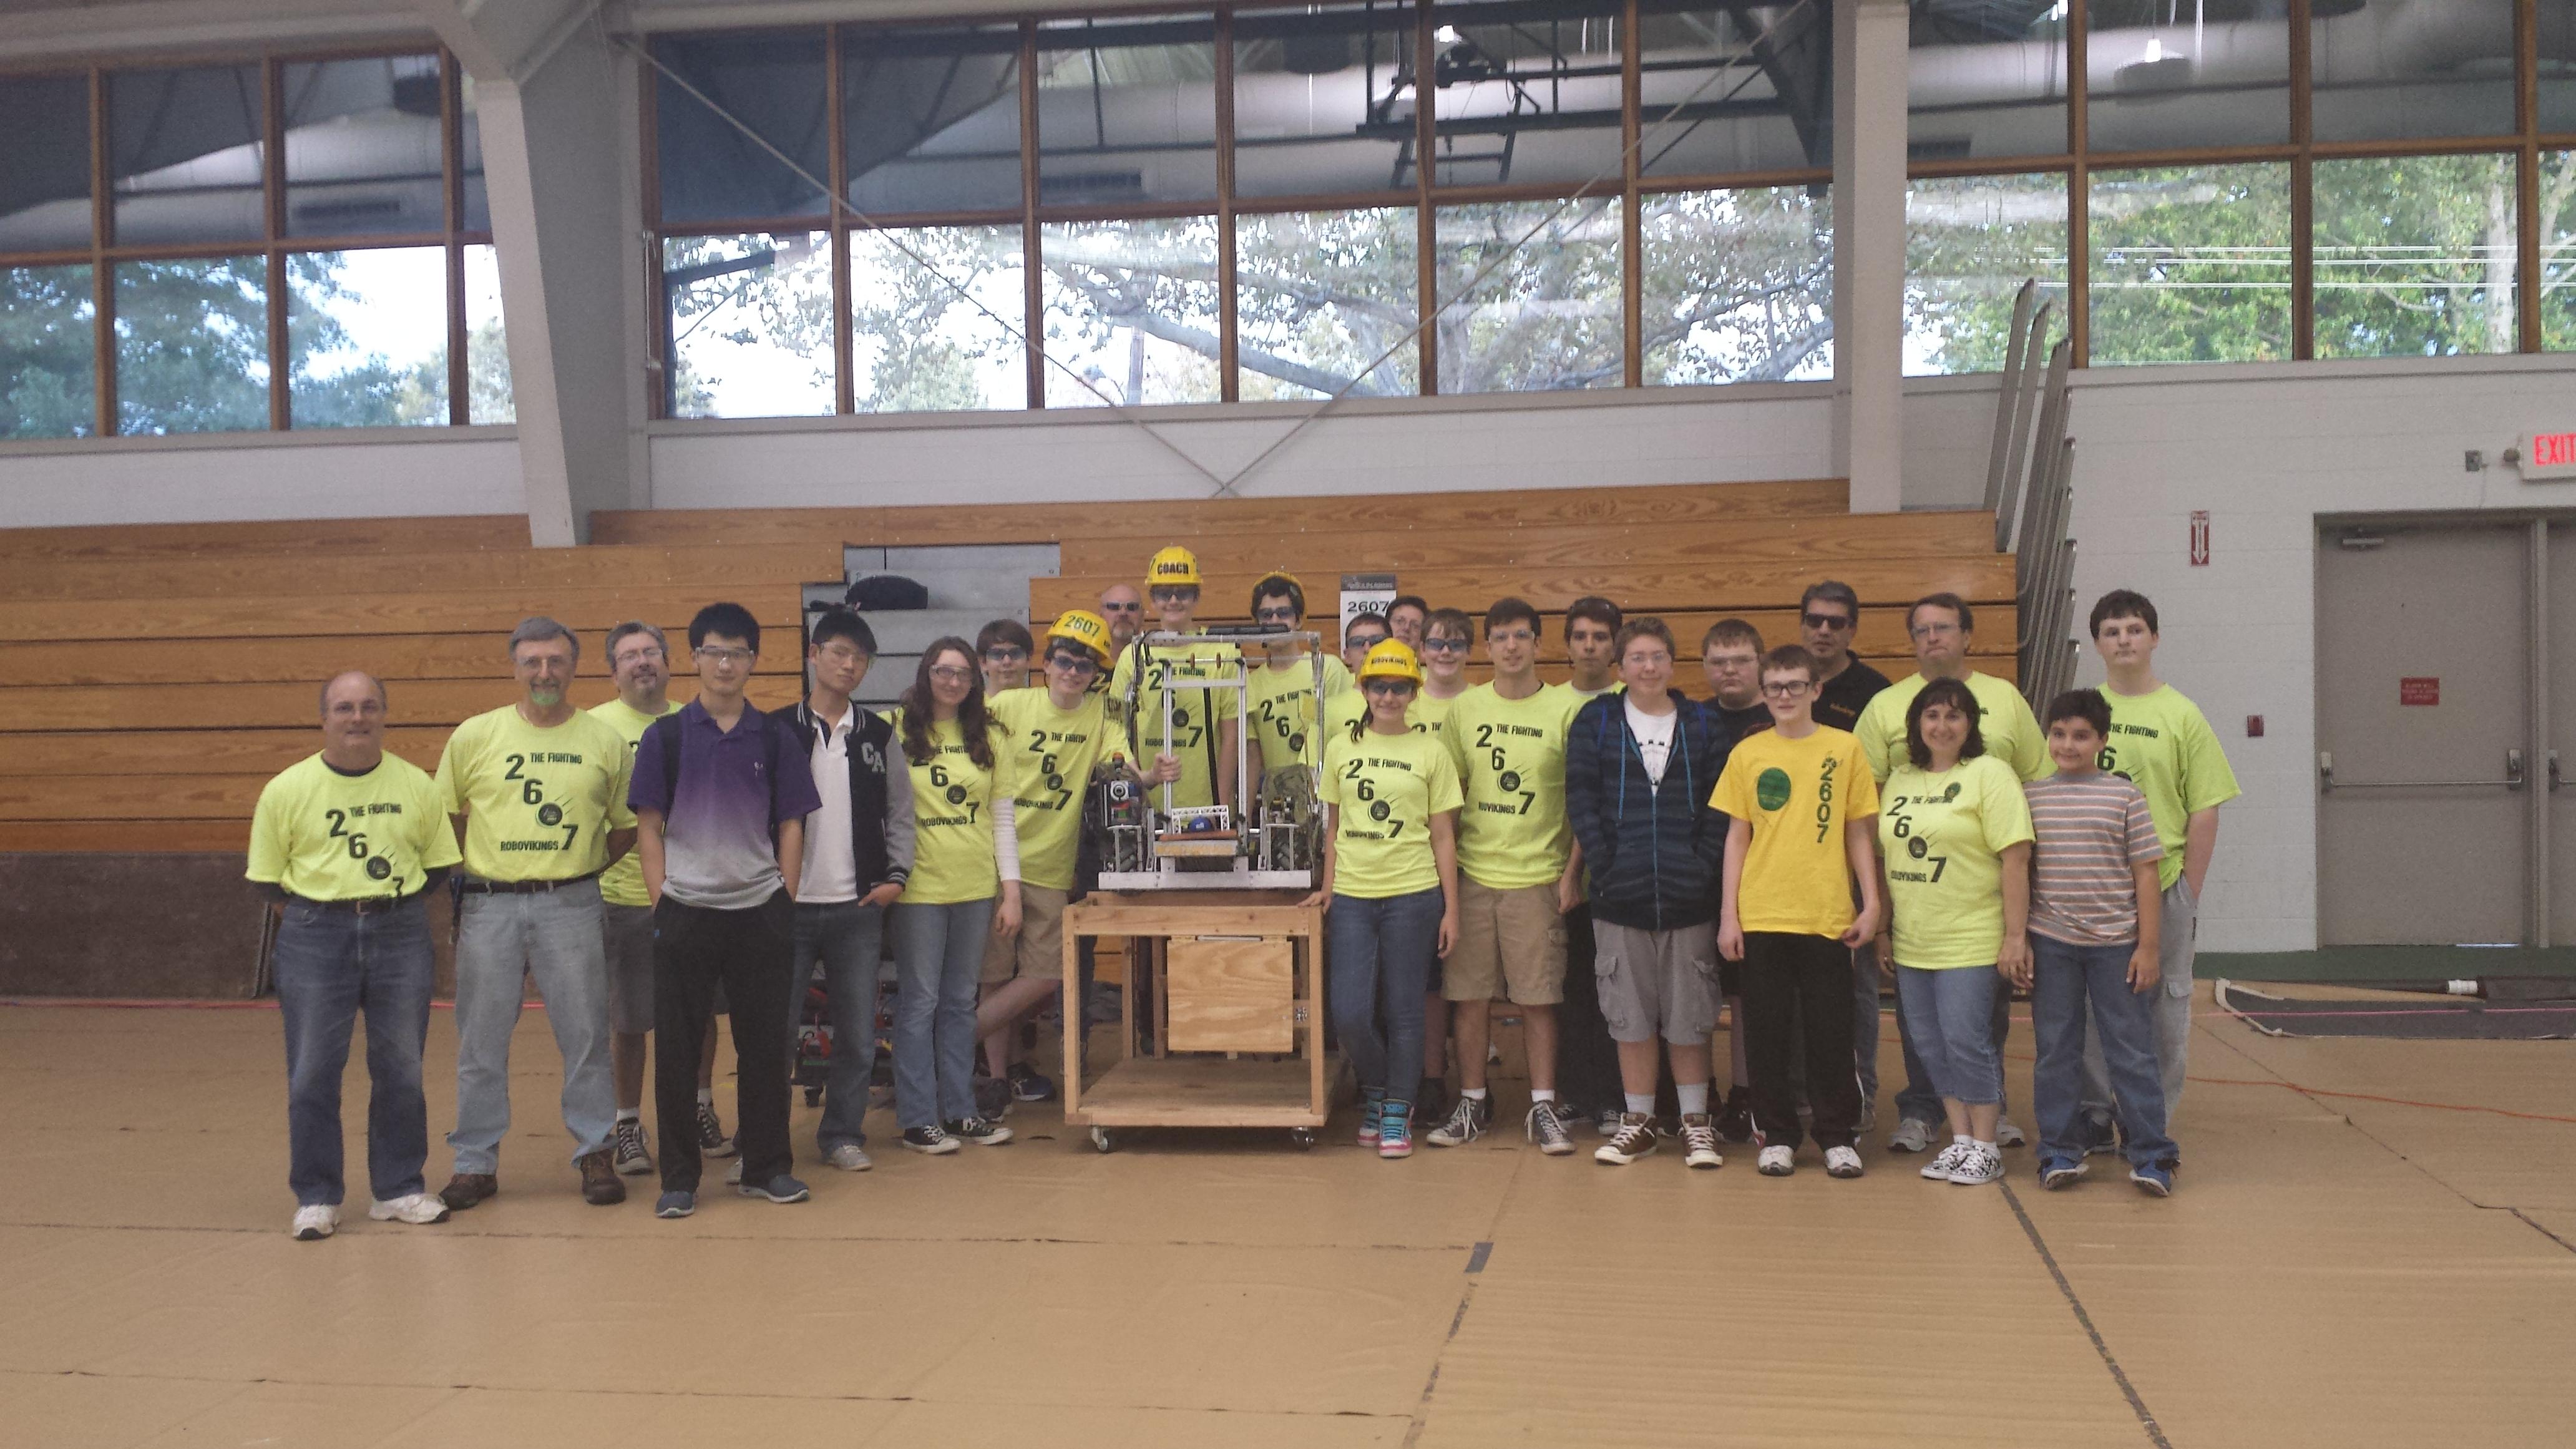 2014-2015 Team 2607